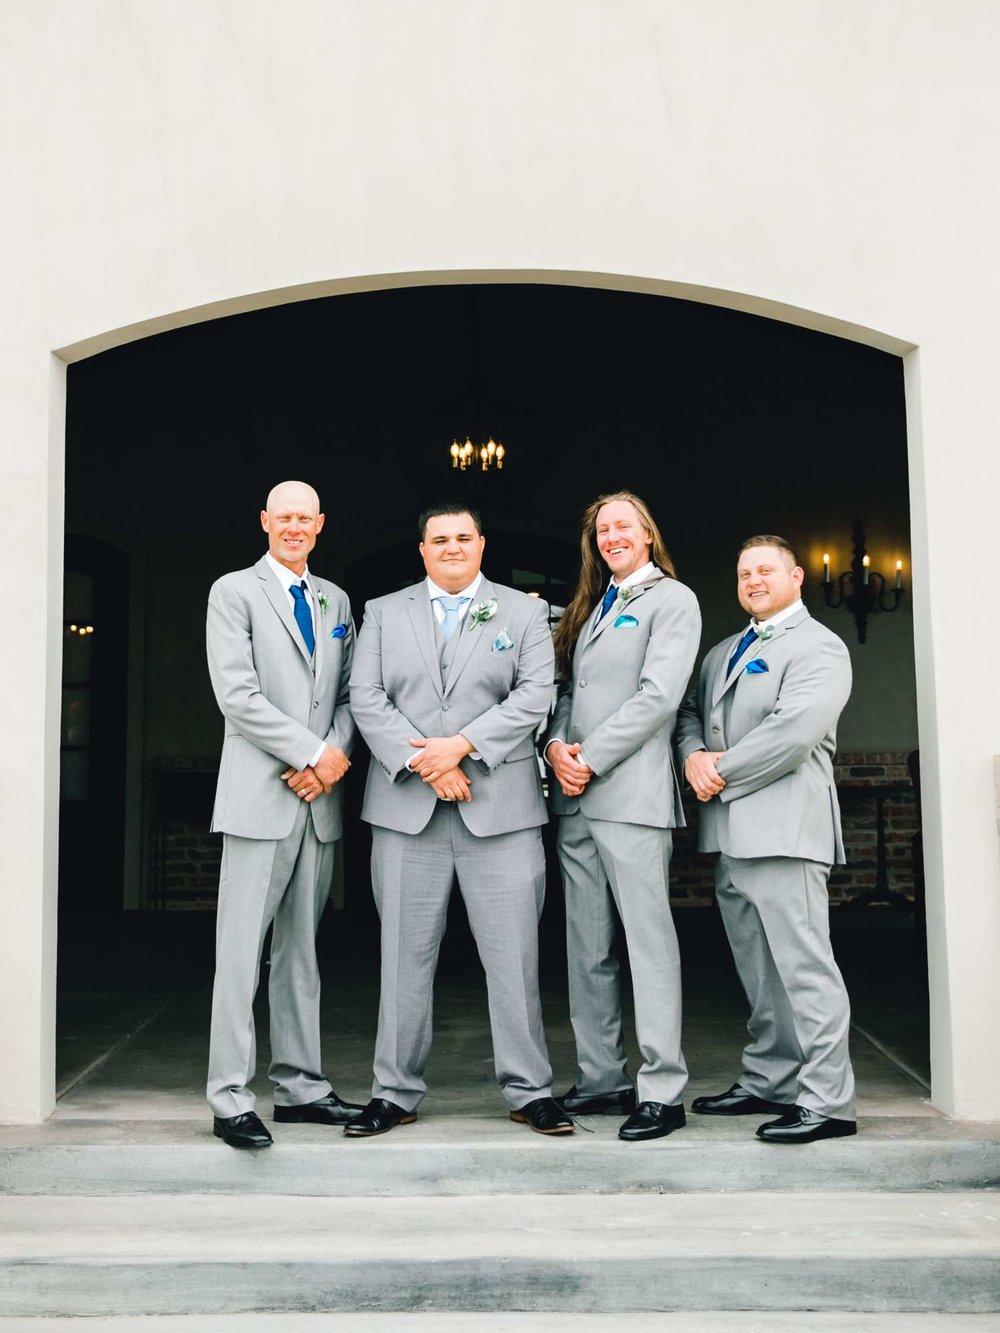 CASSIDY+AND+HARLEY+BRADLEY+EBERLEY+BROOKS+CHAPEL+LUBBOCK+WEDDING+PHOTOGRAPHER+ALLEEJ_0052.jpg